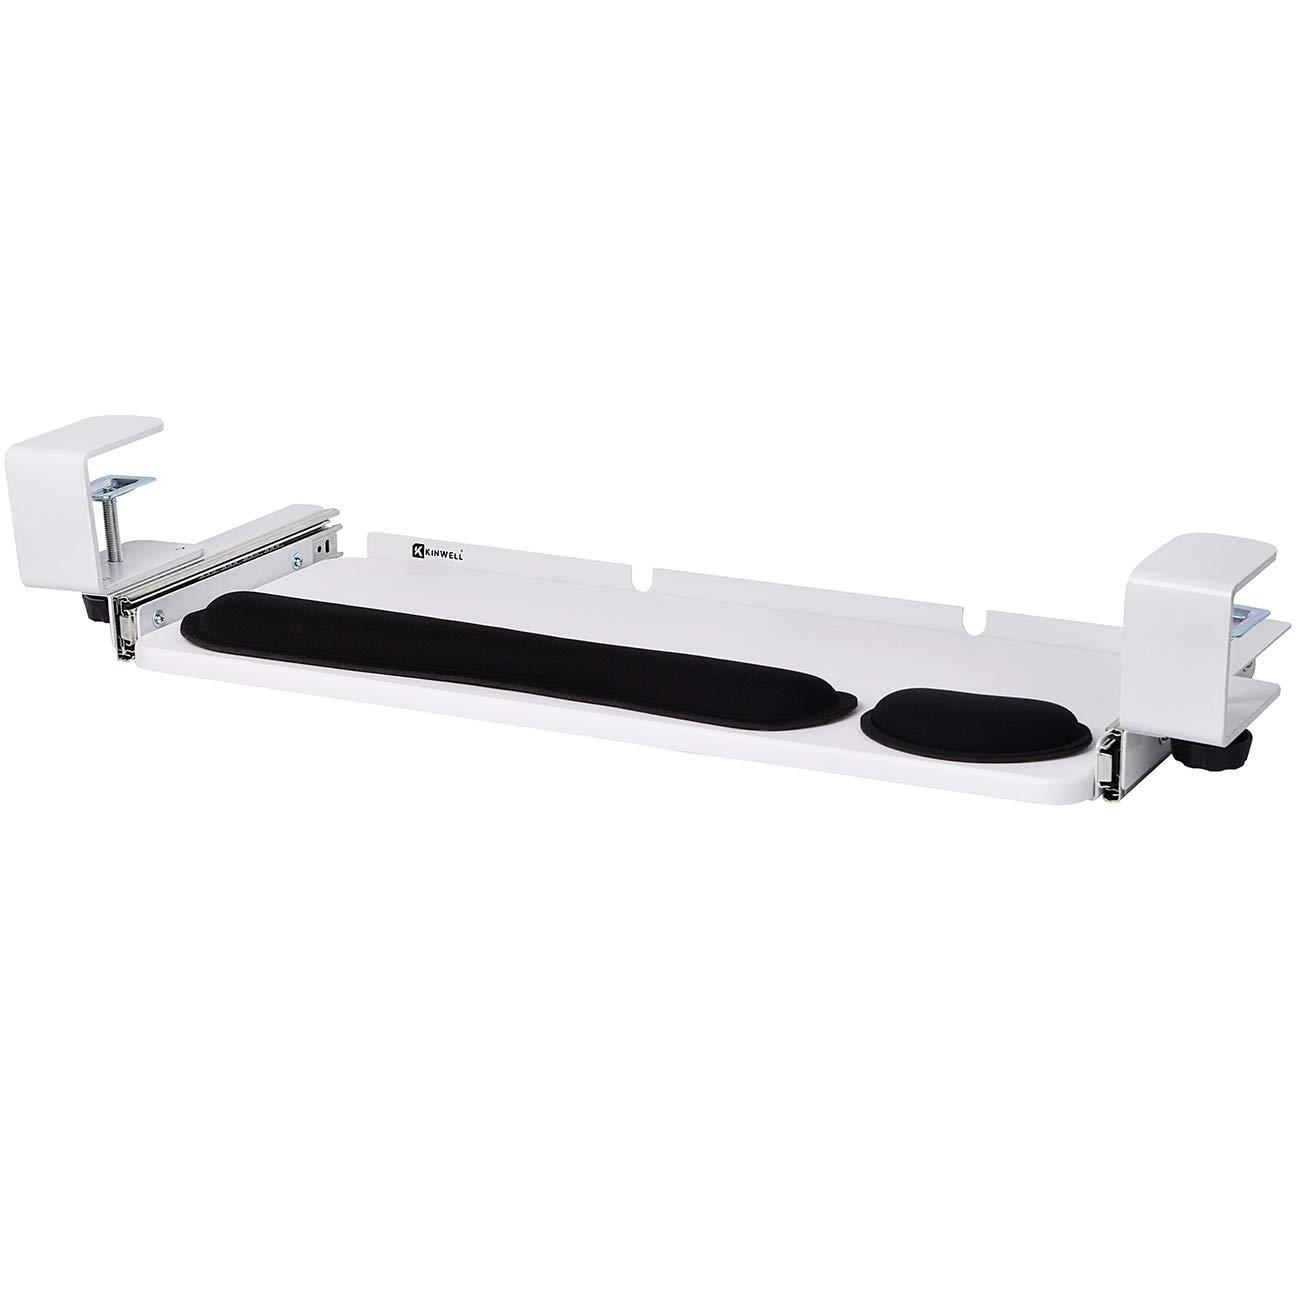 Kinwell Ergonomics Under Table Keyboard Tray Super Easy Clamp on Mechanism Memory Foam Wrist Rest Straps (25'' White)